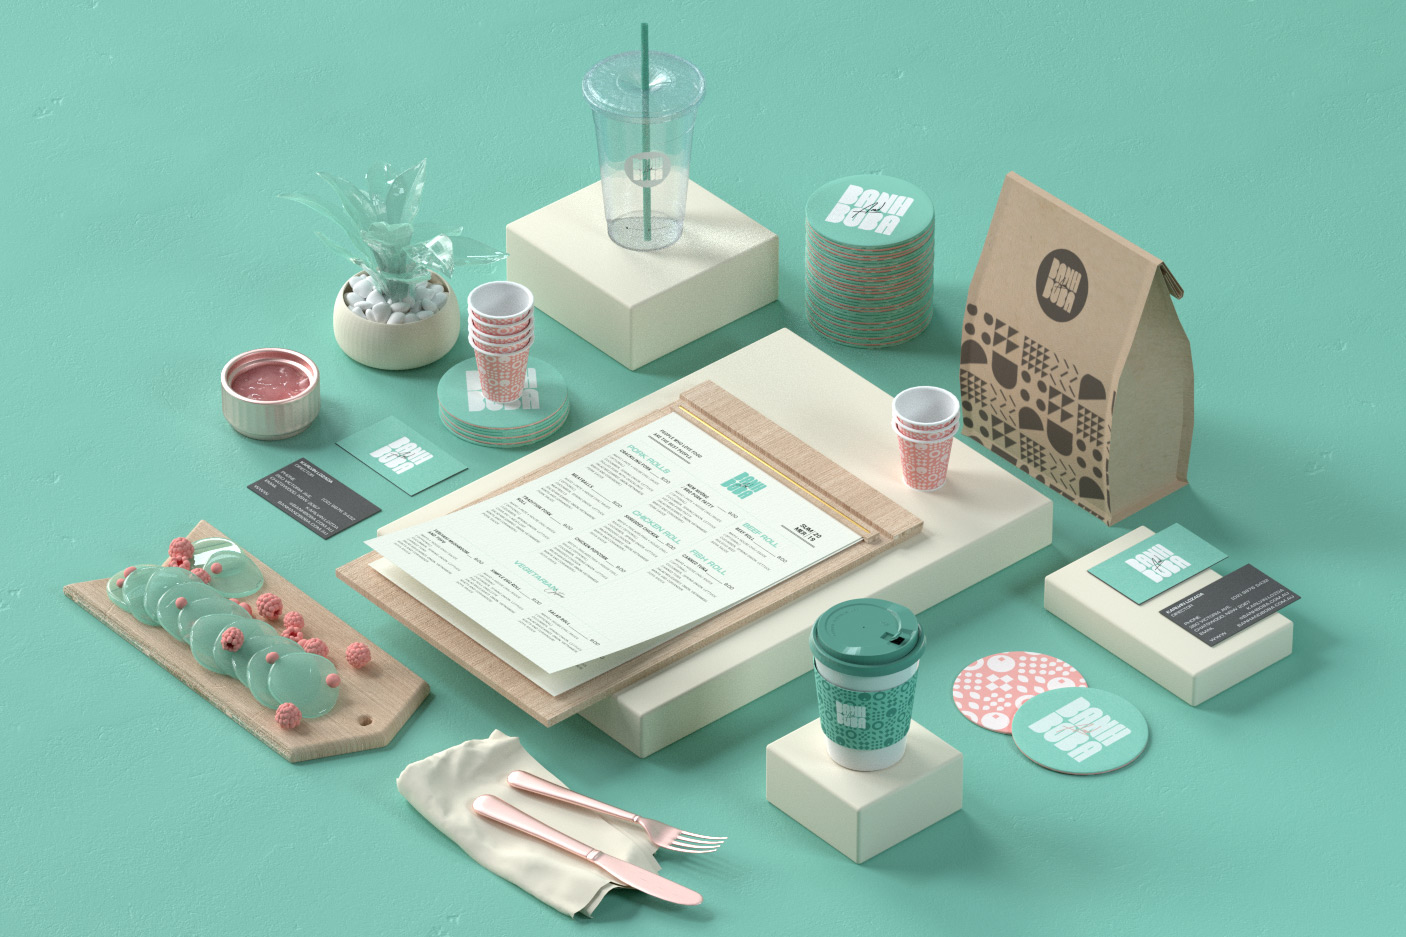 Banh and Boba application and packaging design